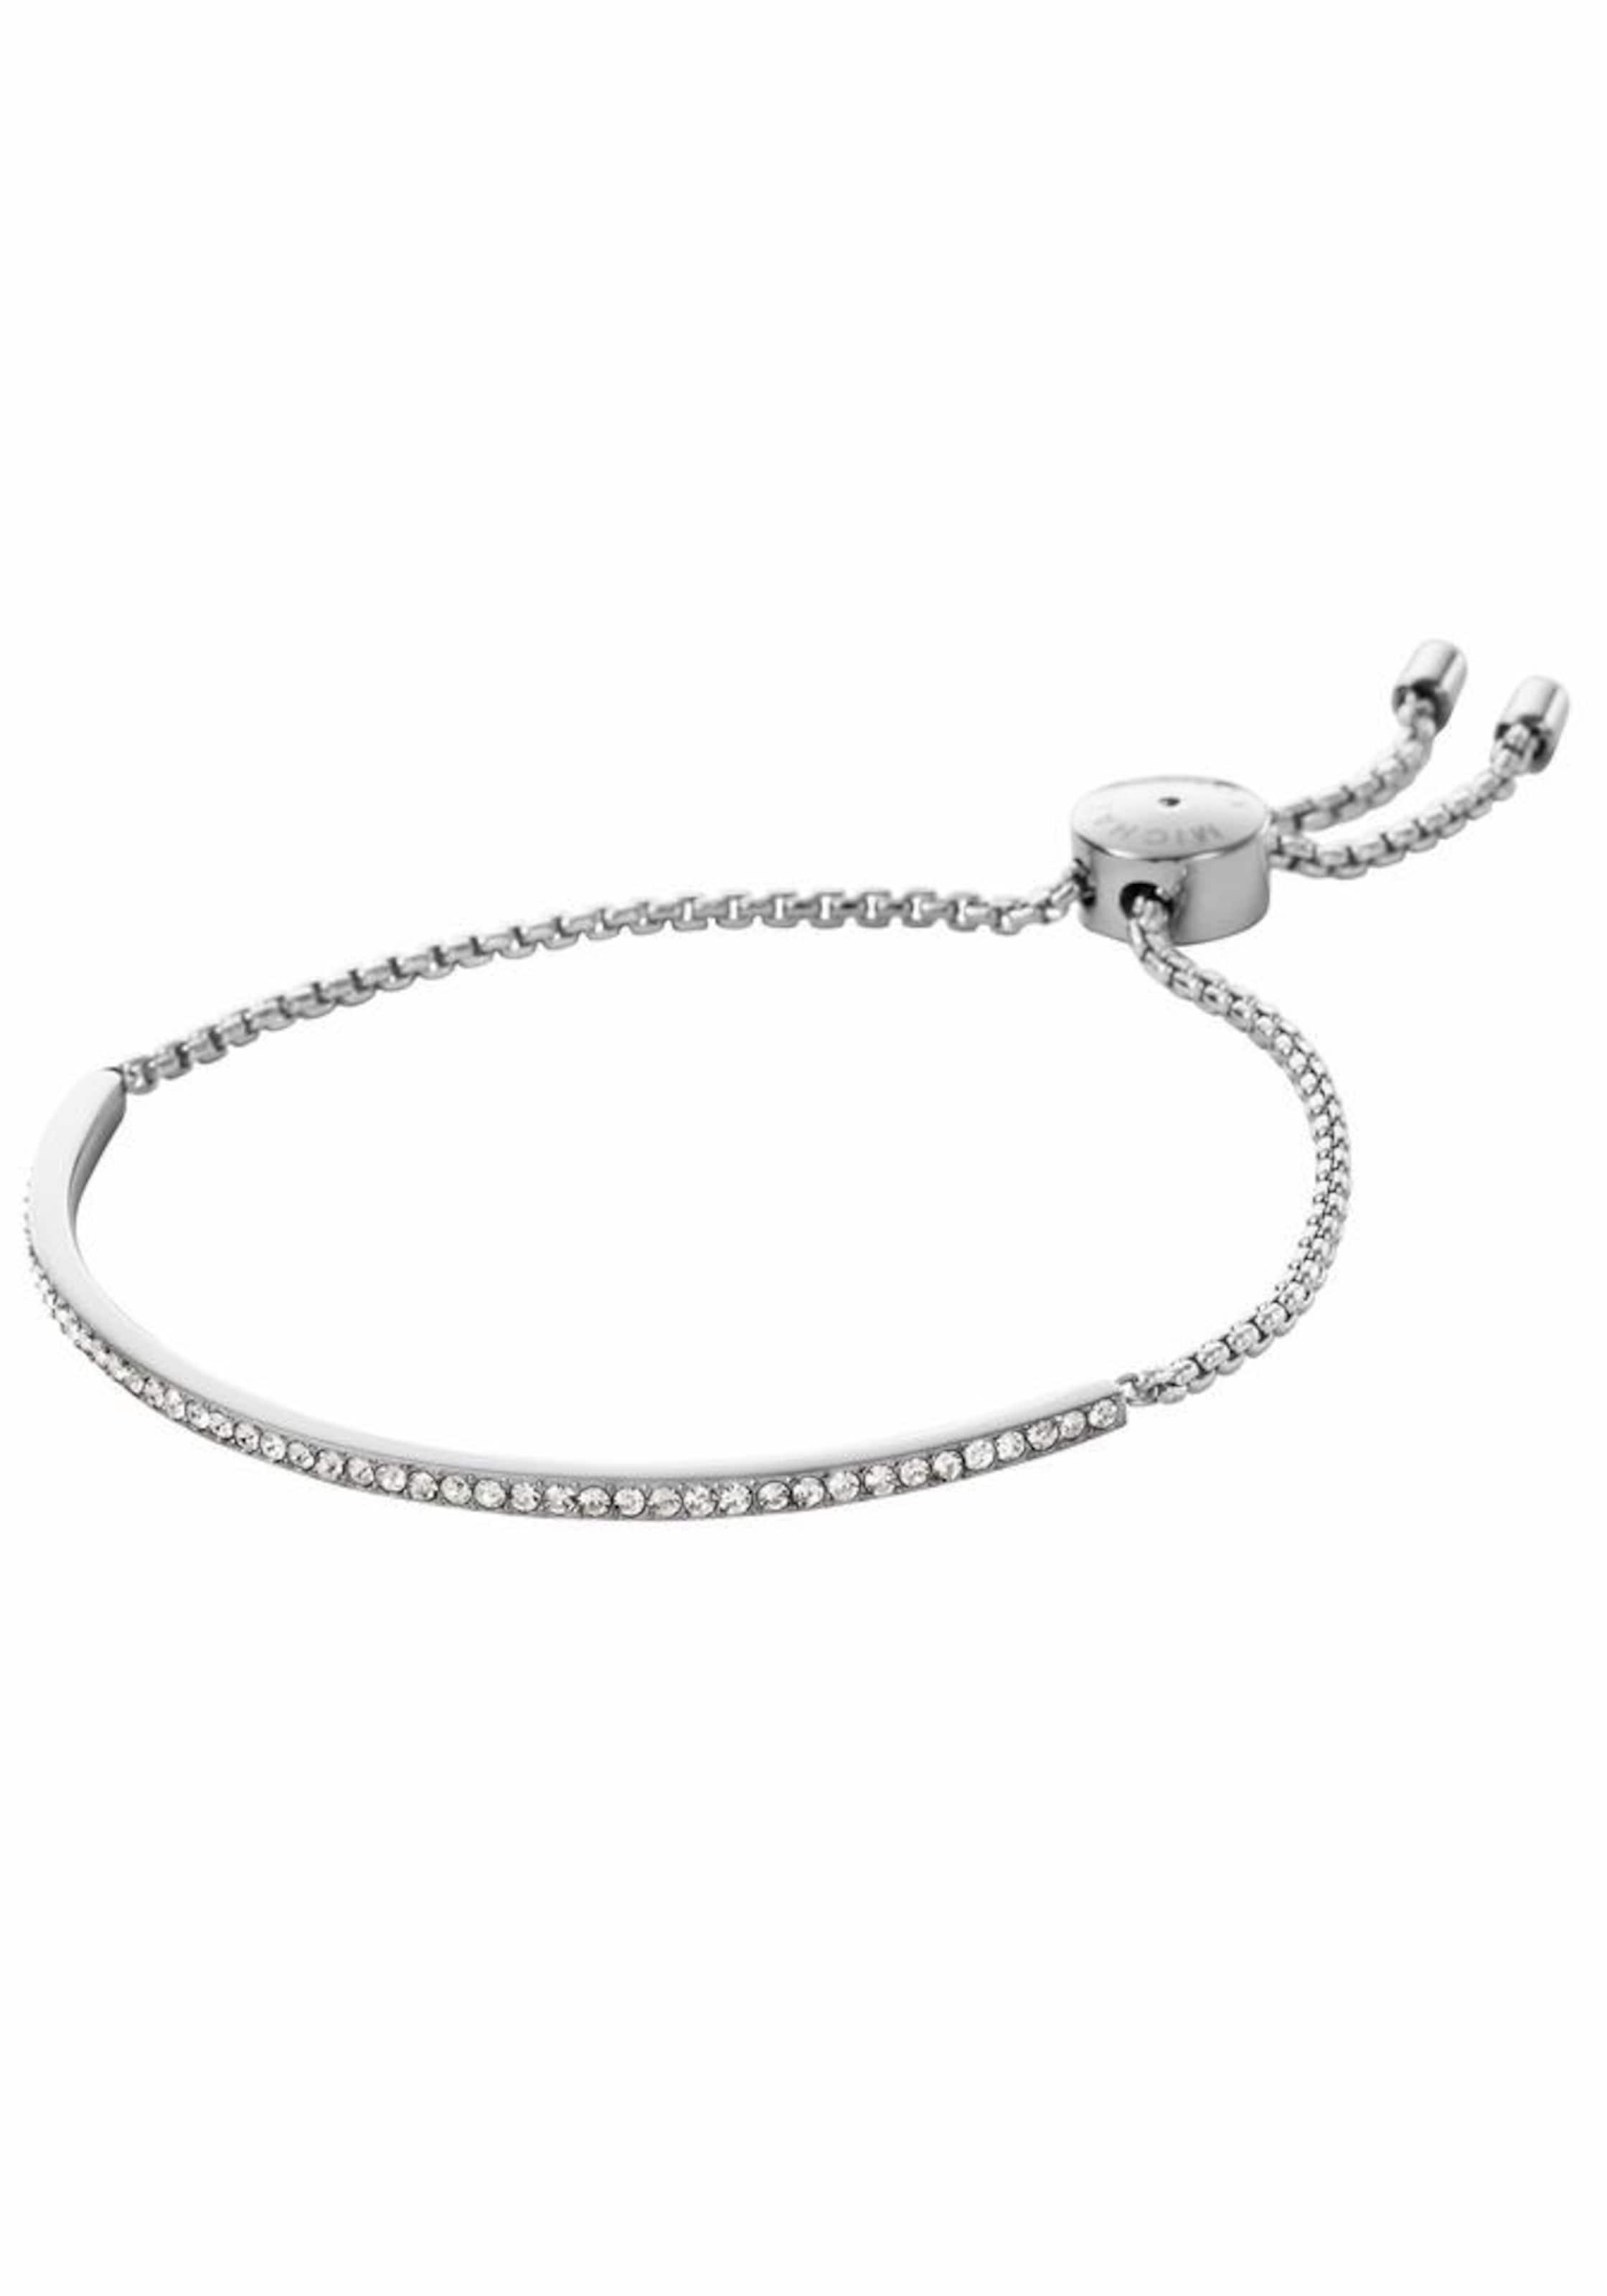 Michael Kors Armband 'MKJ4131040' Finish Günstiger Preis Neue Ankunft Günstig Online Freies Verschiffen Neuestes oxszbJIY